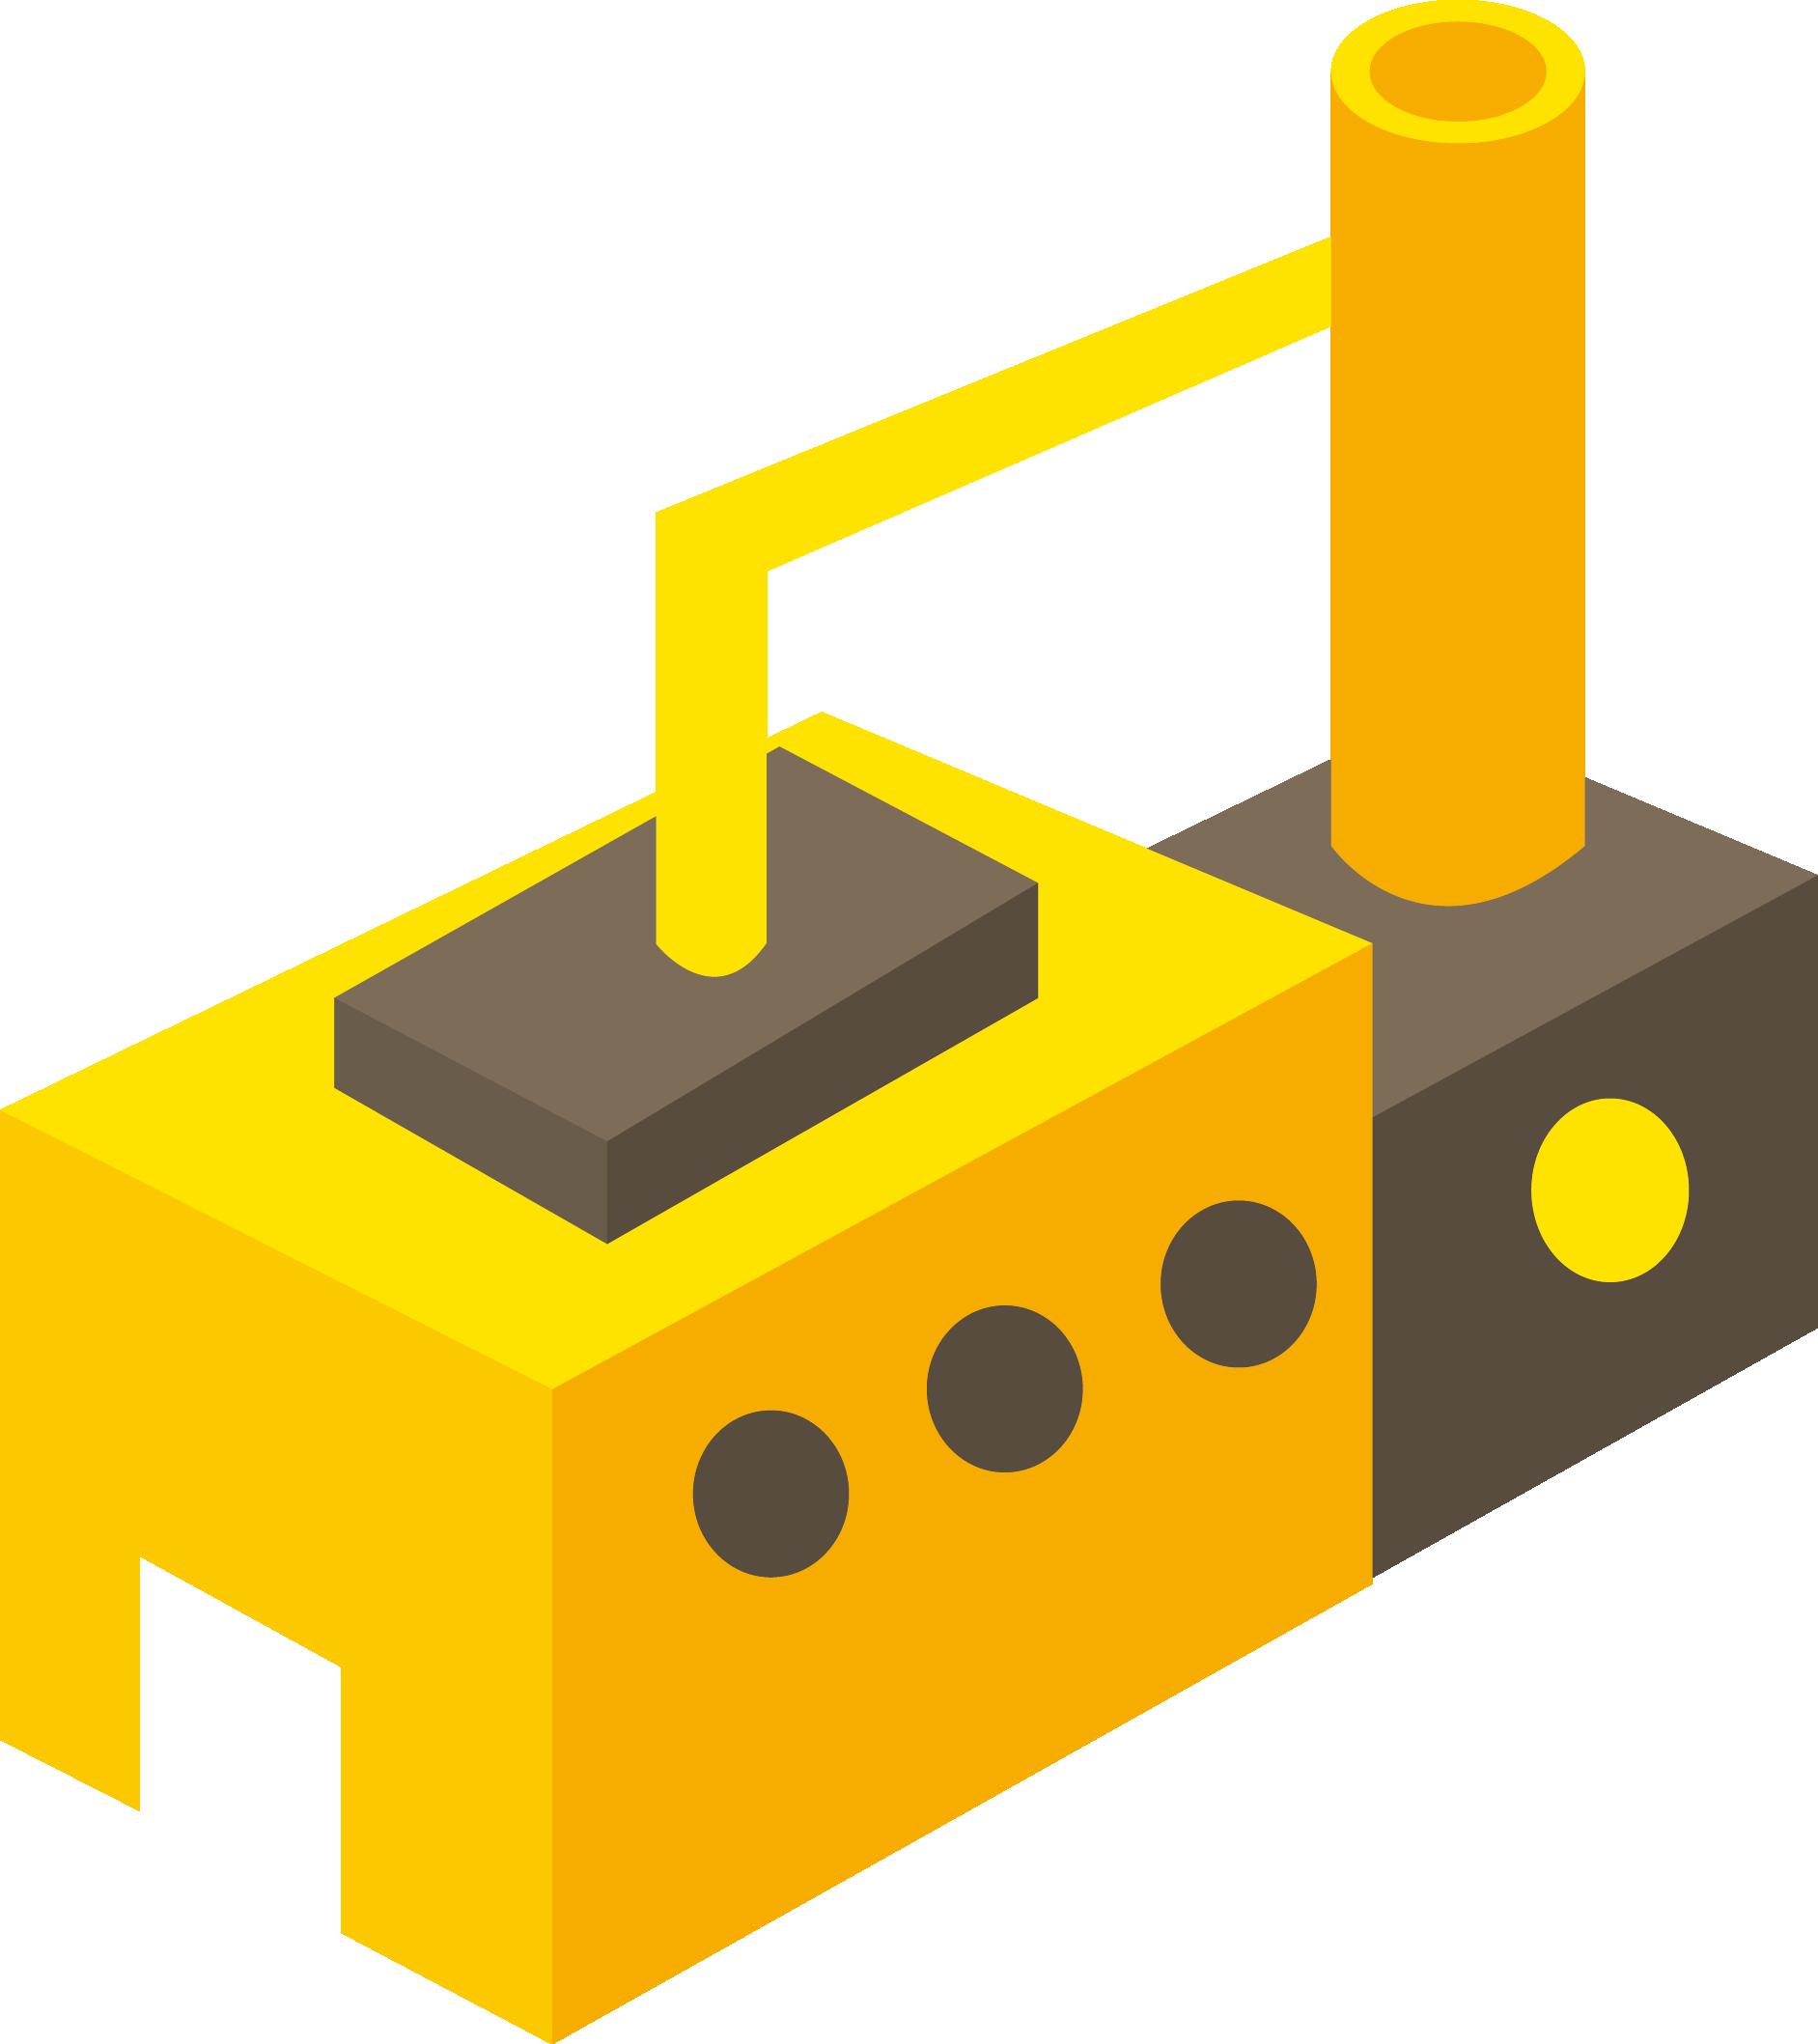 Building icon brick design. Factory clipart factory warehouse